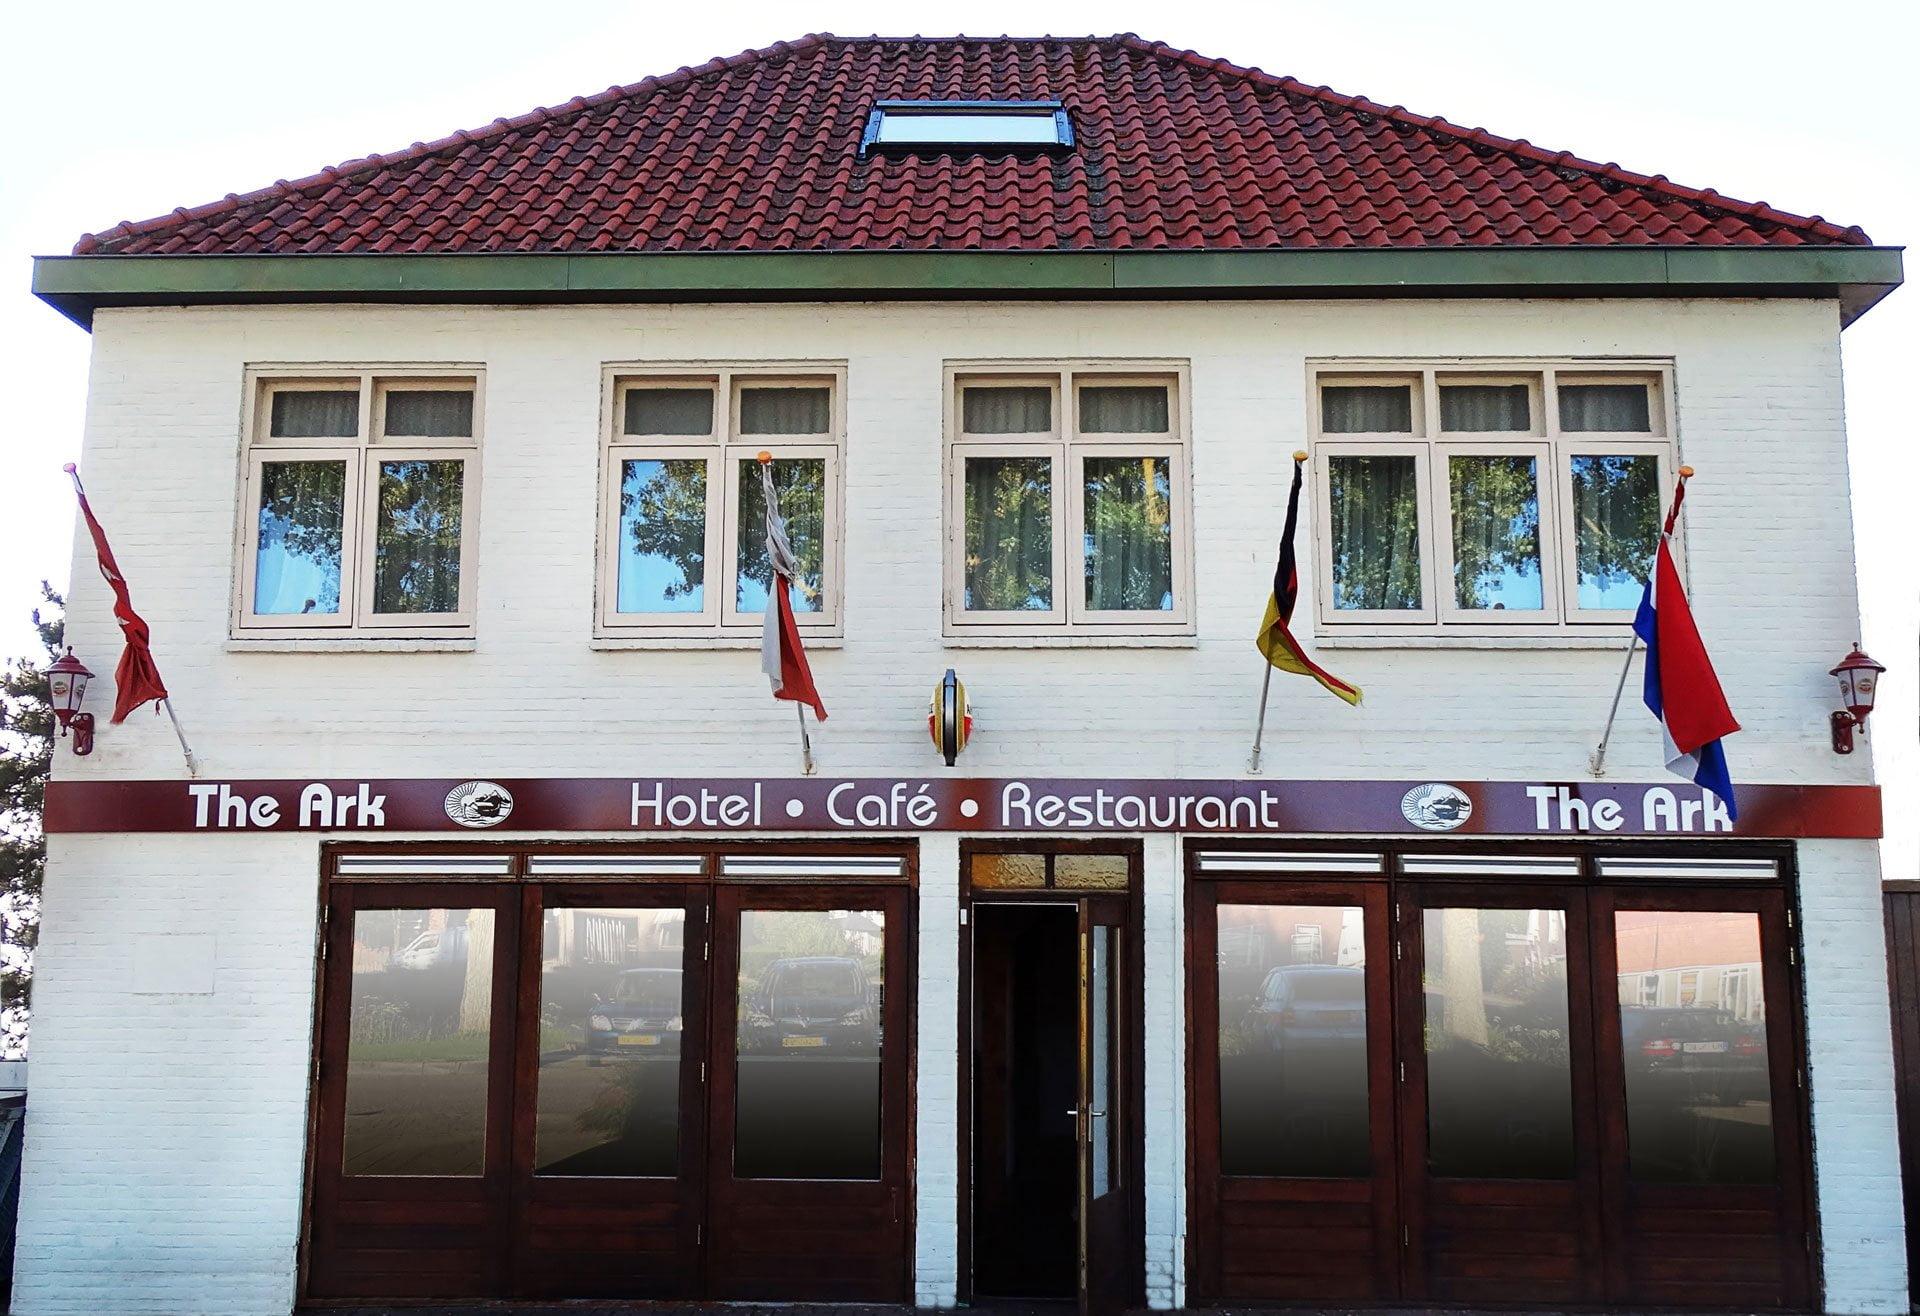 Hotel The Ark 't Zand Noord Holland